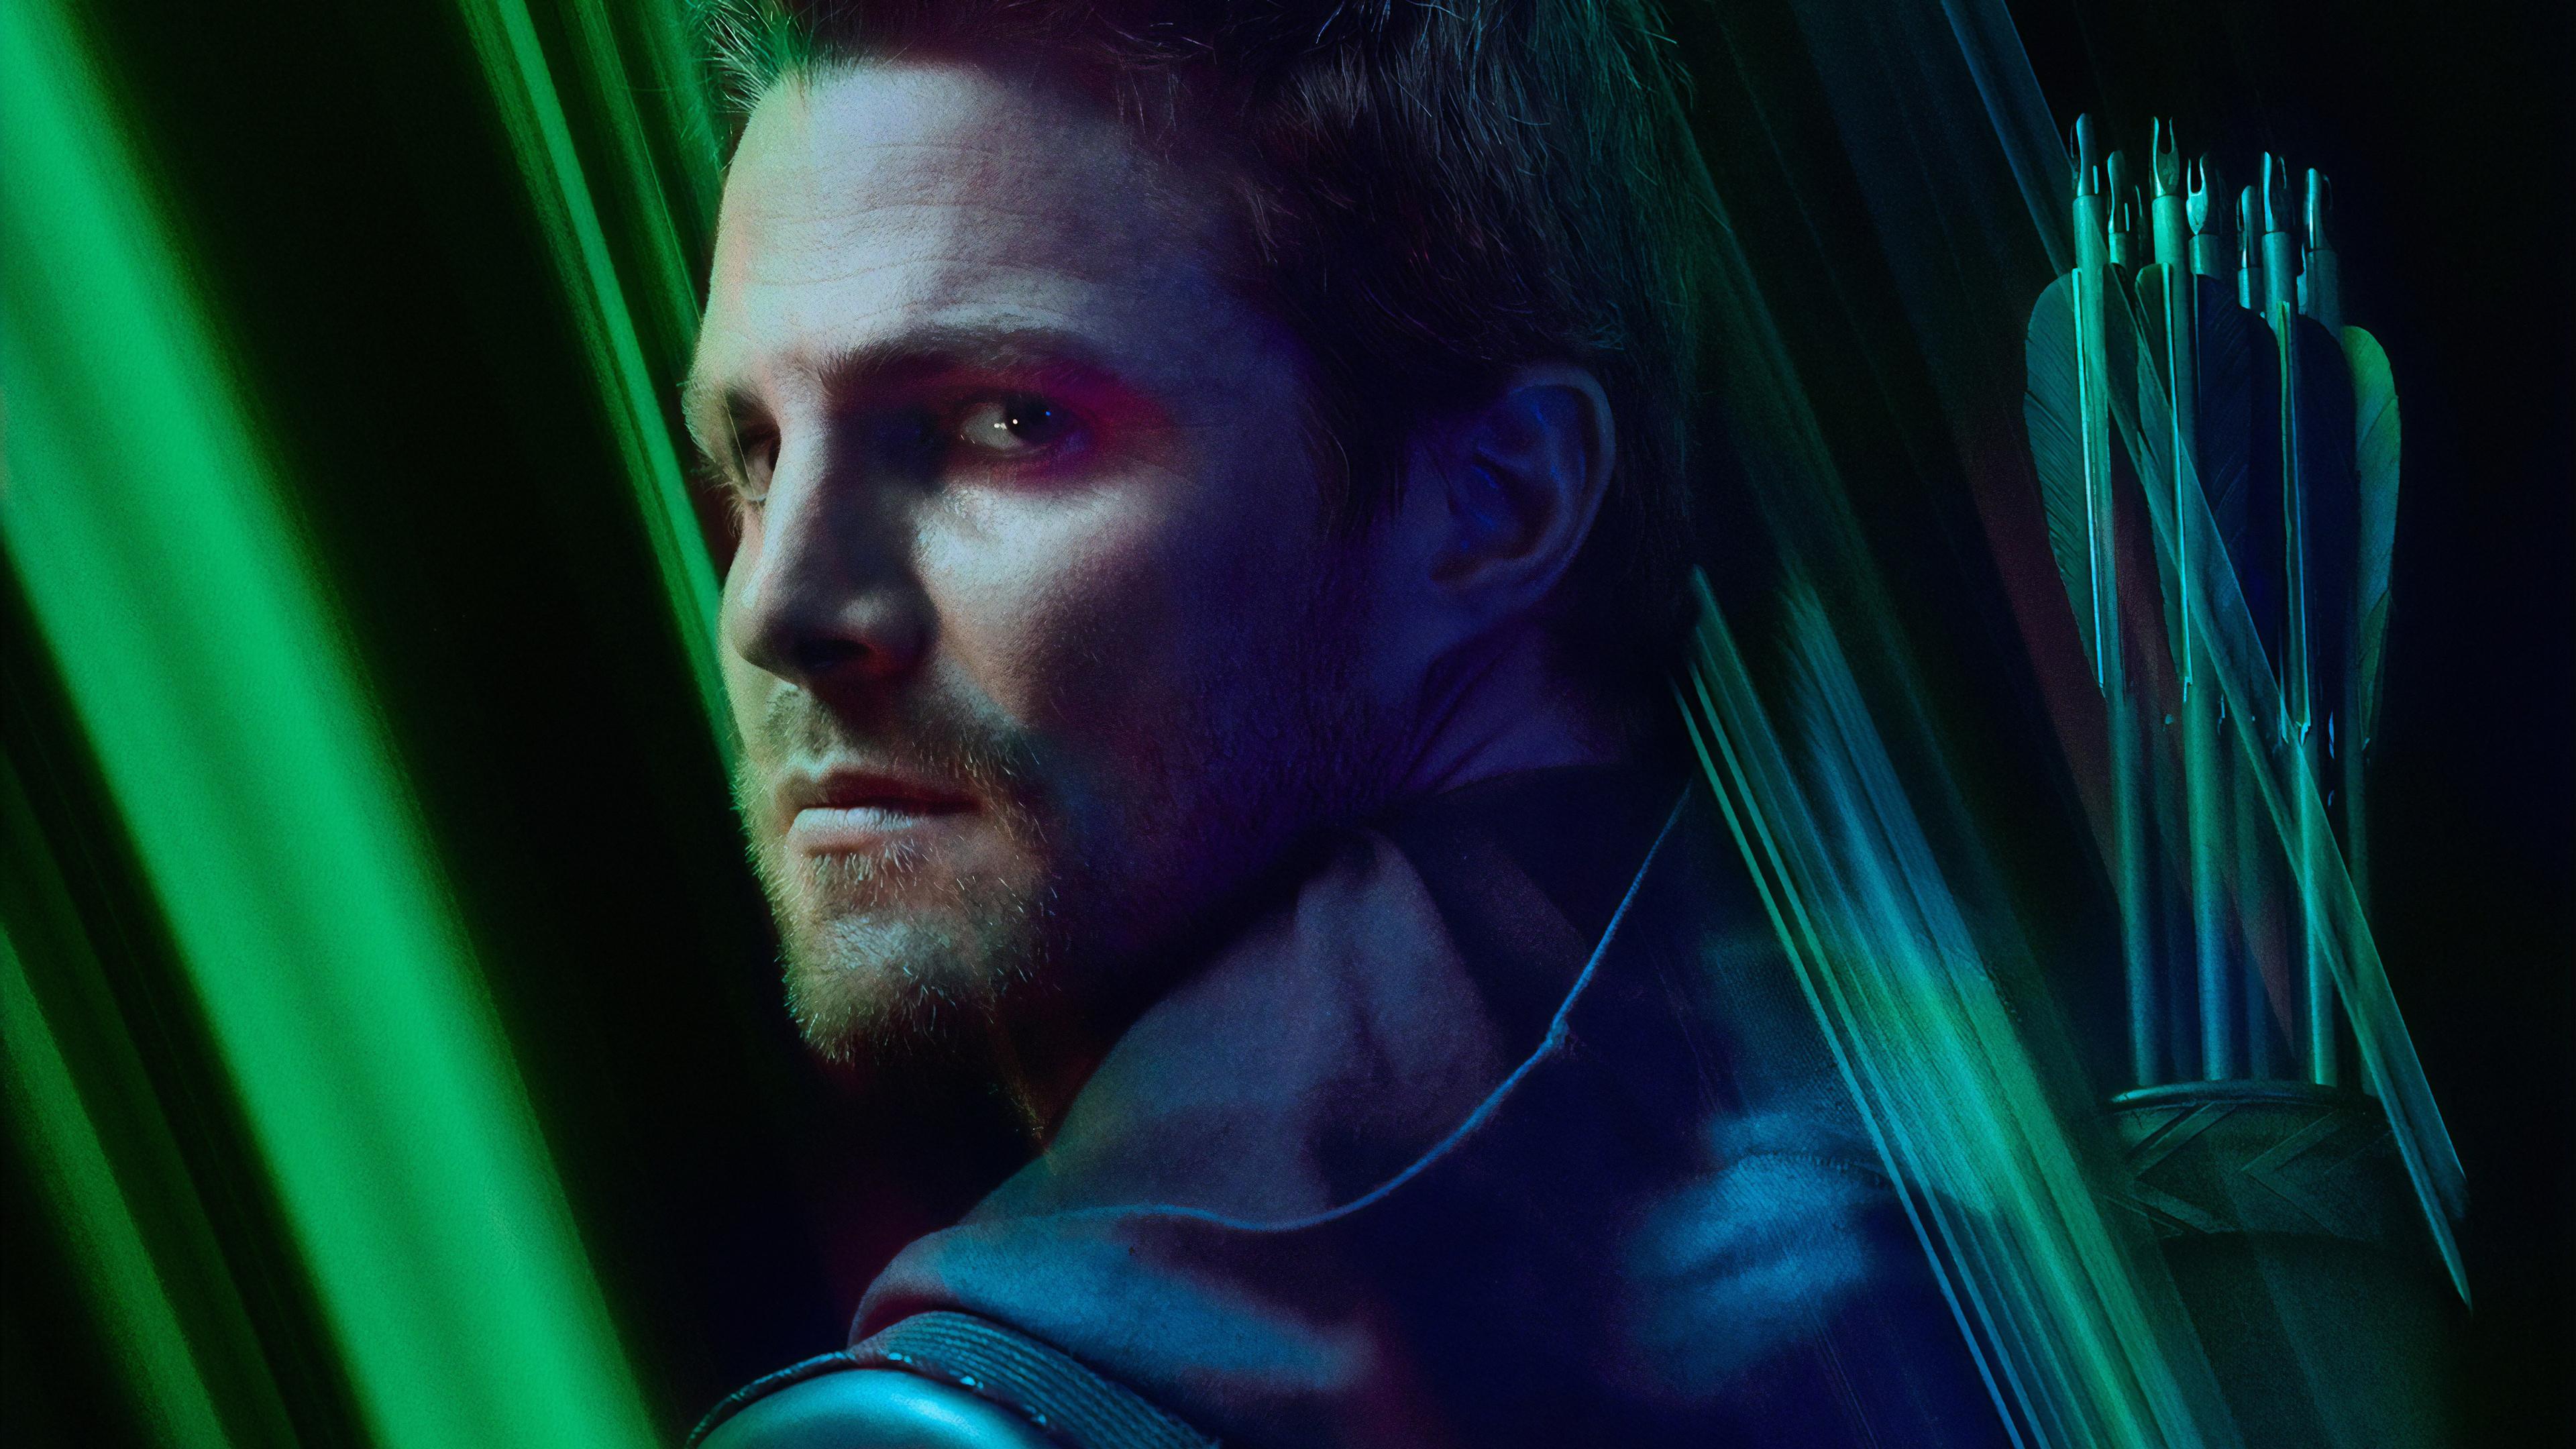 oliver queen in arrow season 8 1577915268 - Oliver Queen In Arrow Season 8 -